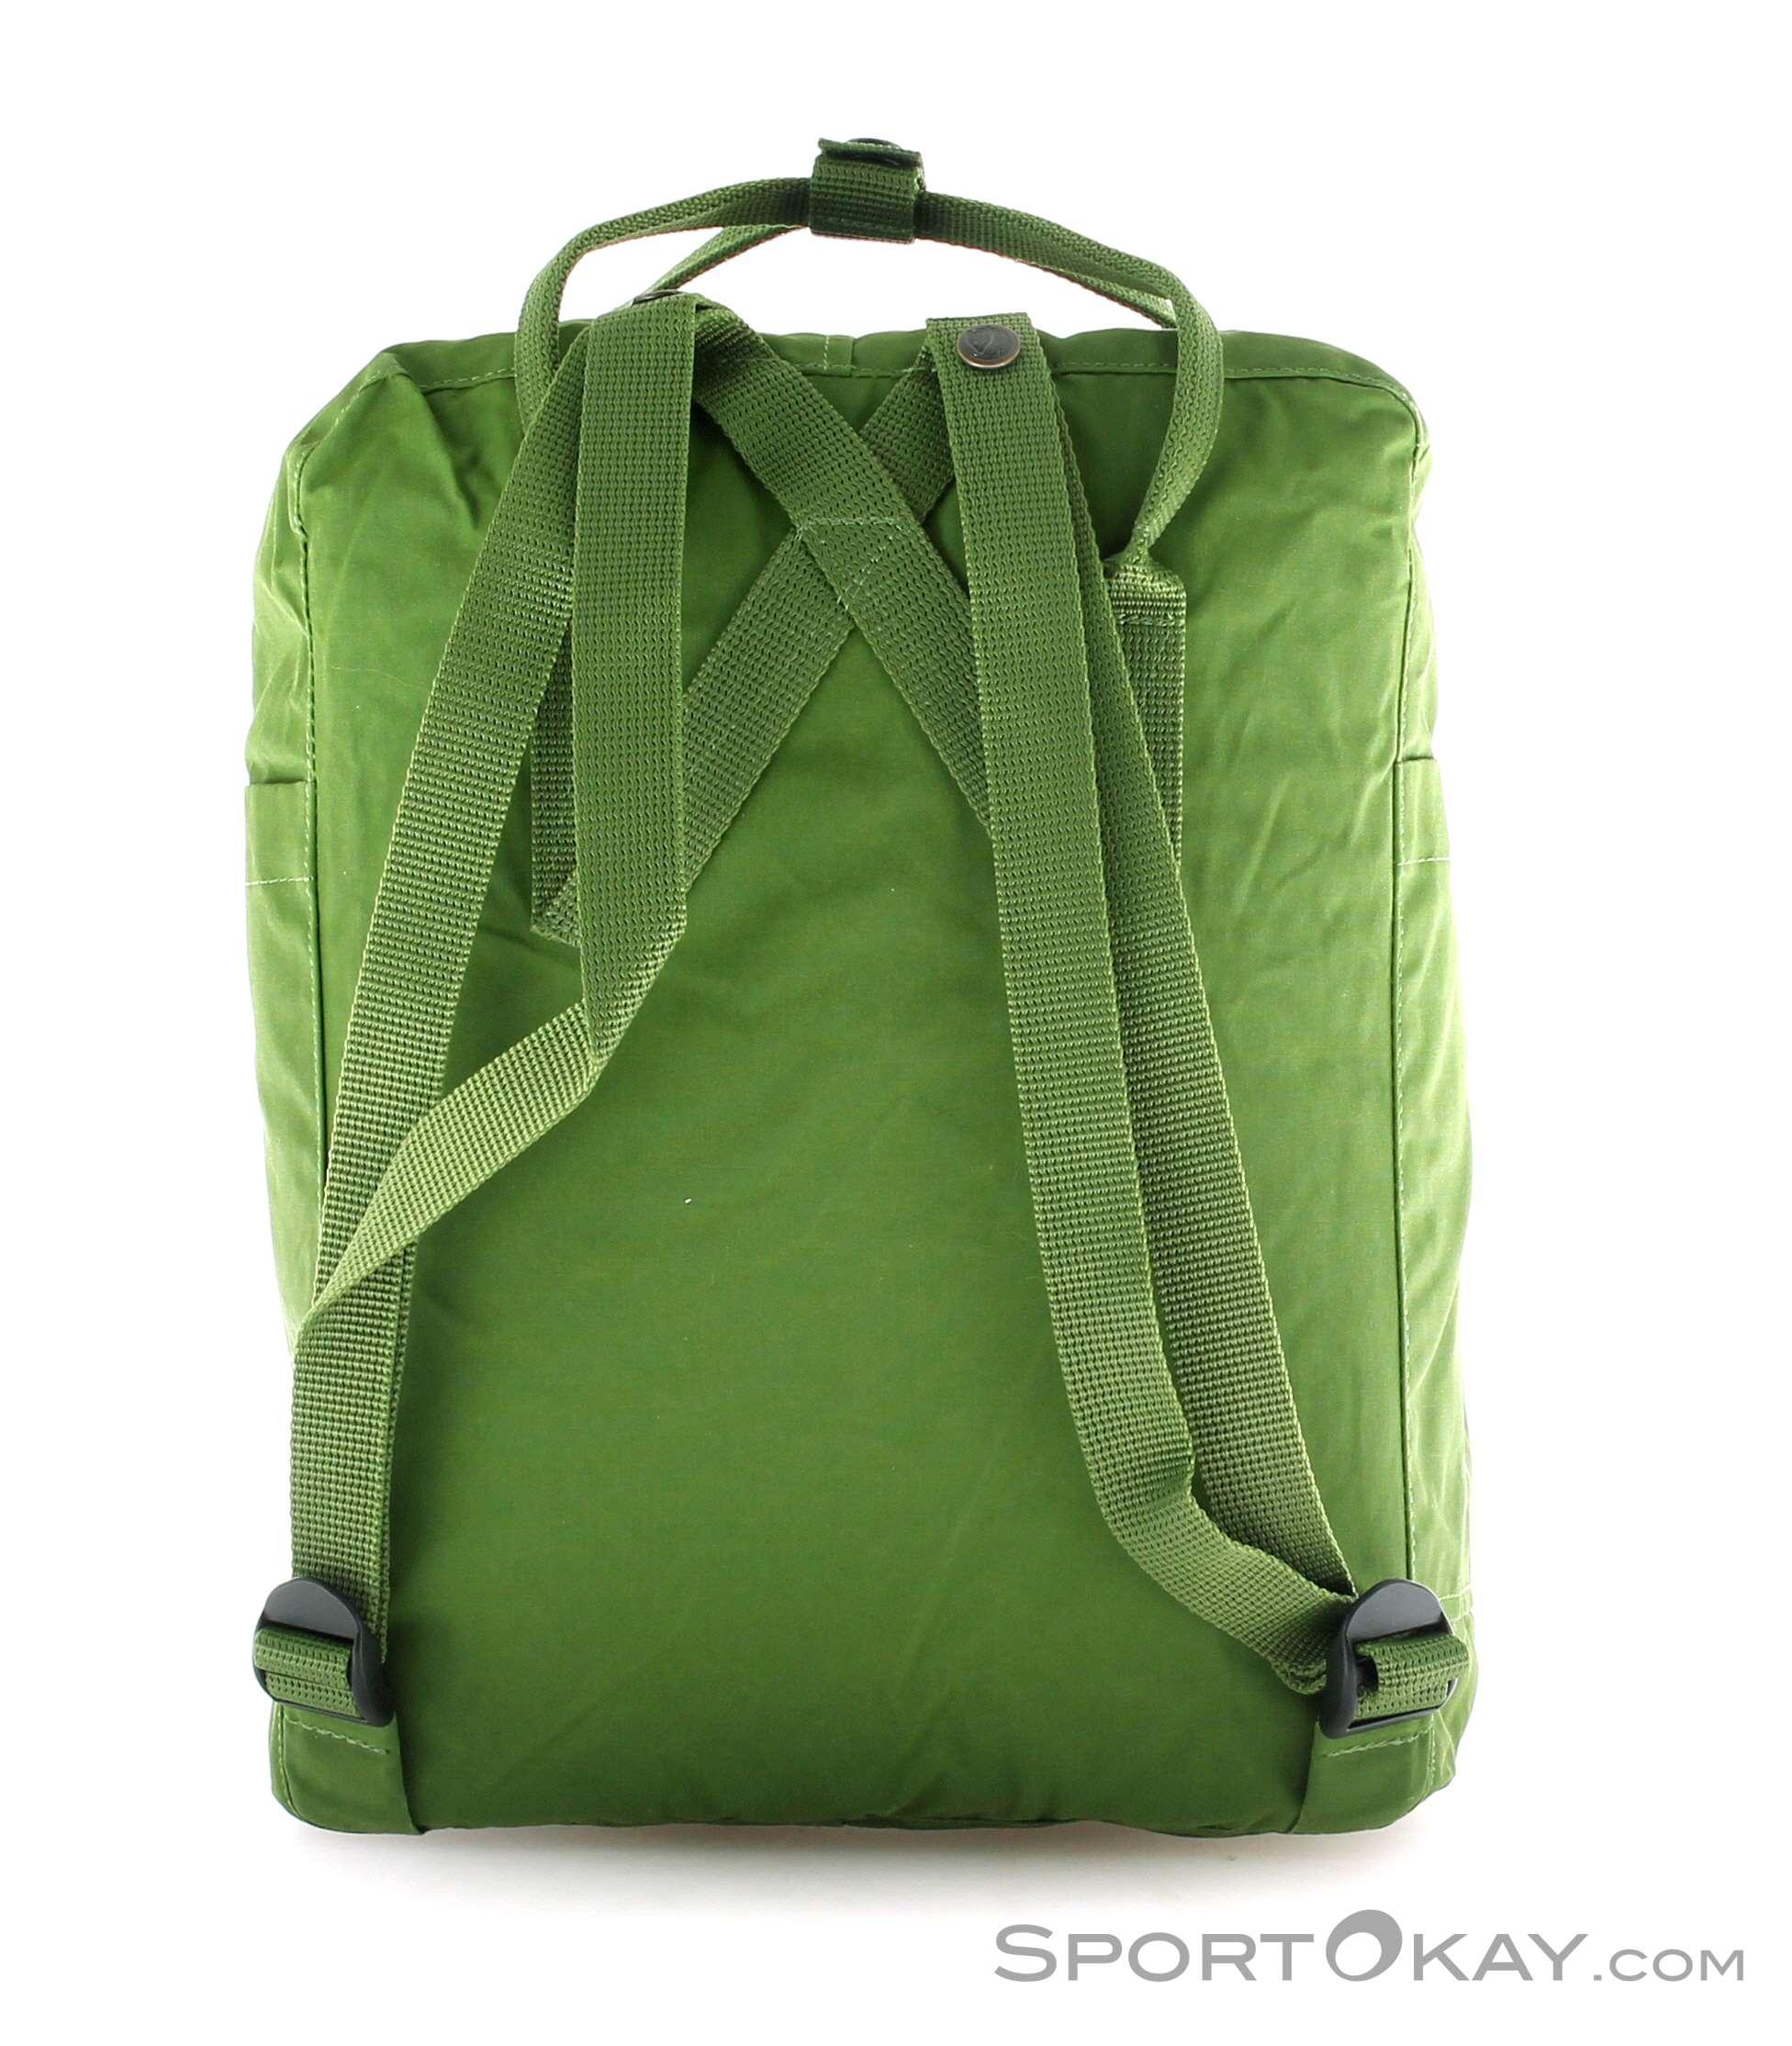 Fjllrven Kanken 16l Backpack Bags Leisure Fashion All Fjallraven Classic Ocean Green Olive Dark Male 0211